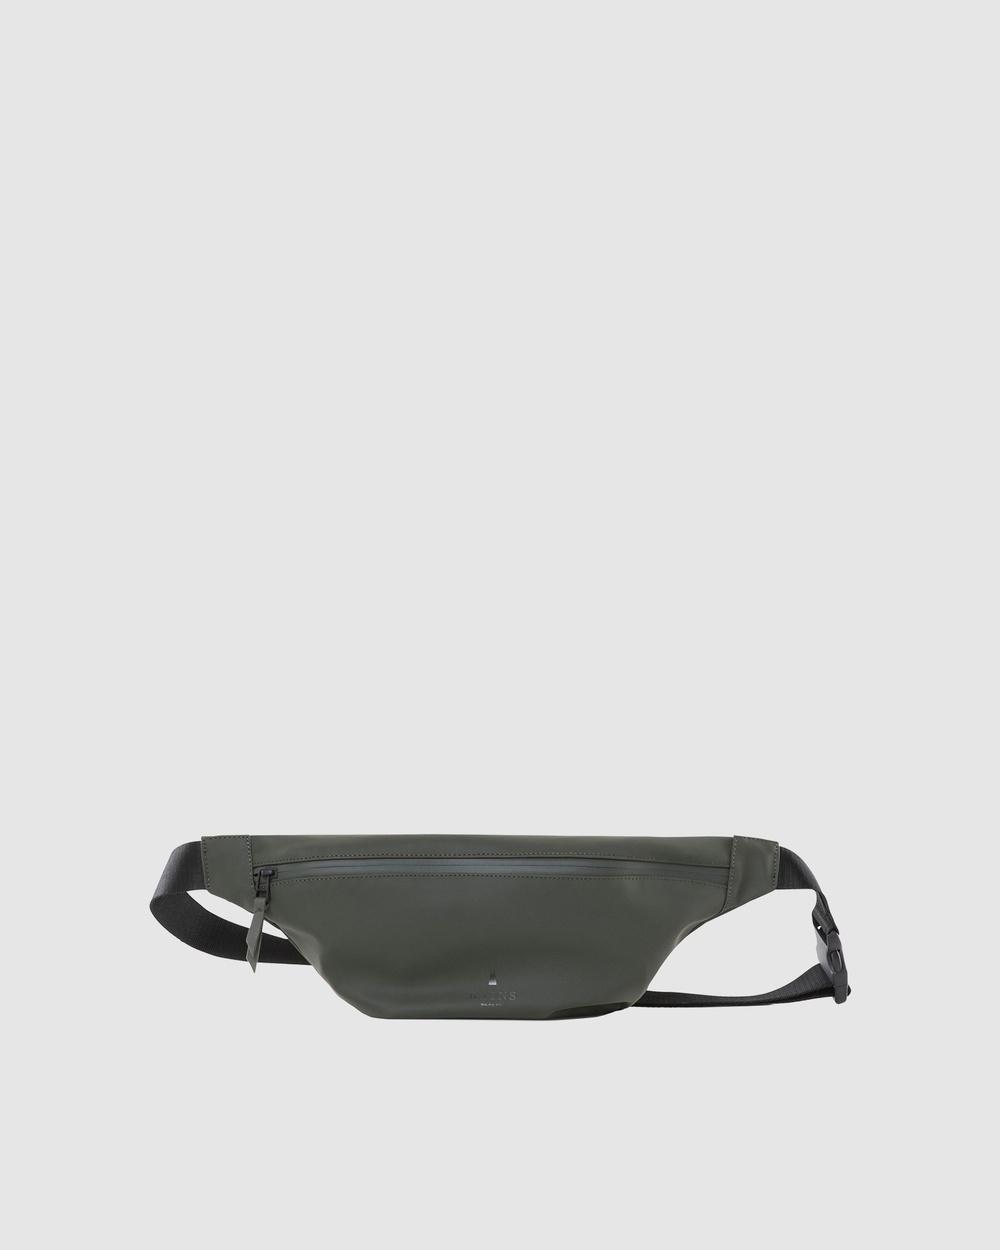 RAINS Bum Bag Bags Green